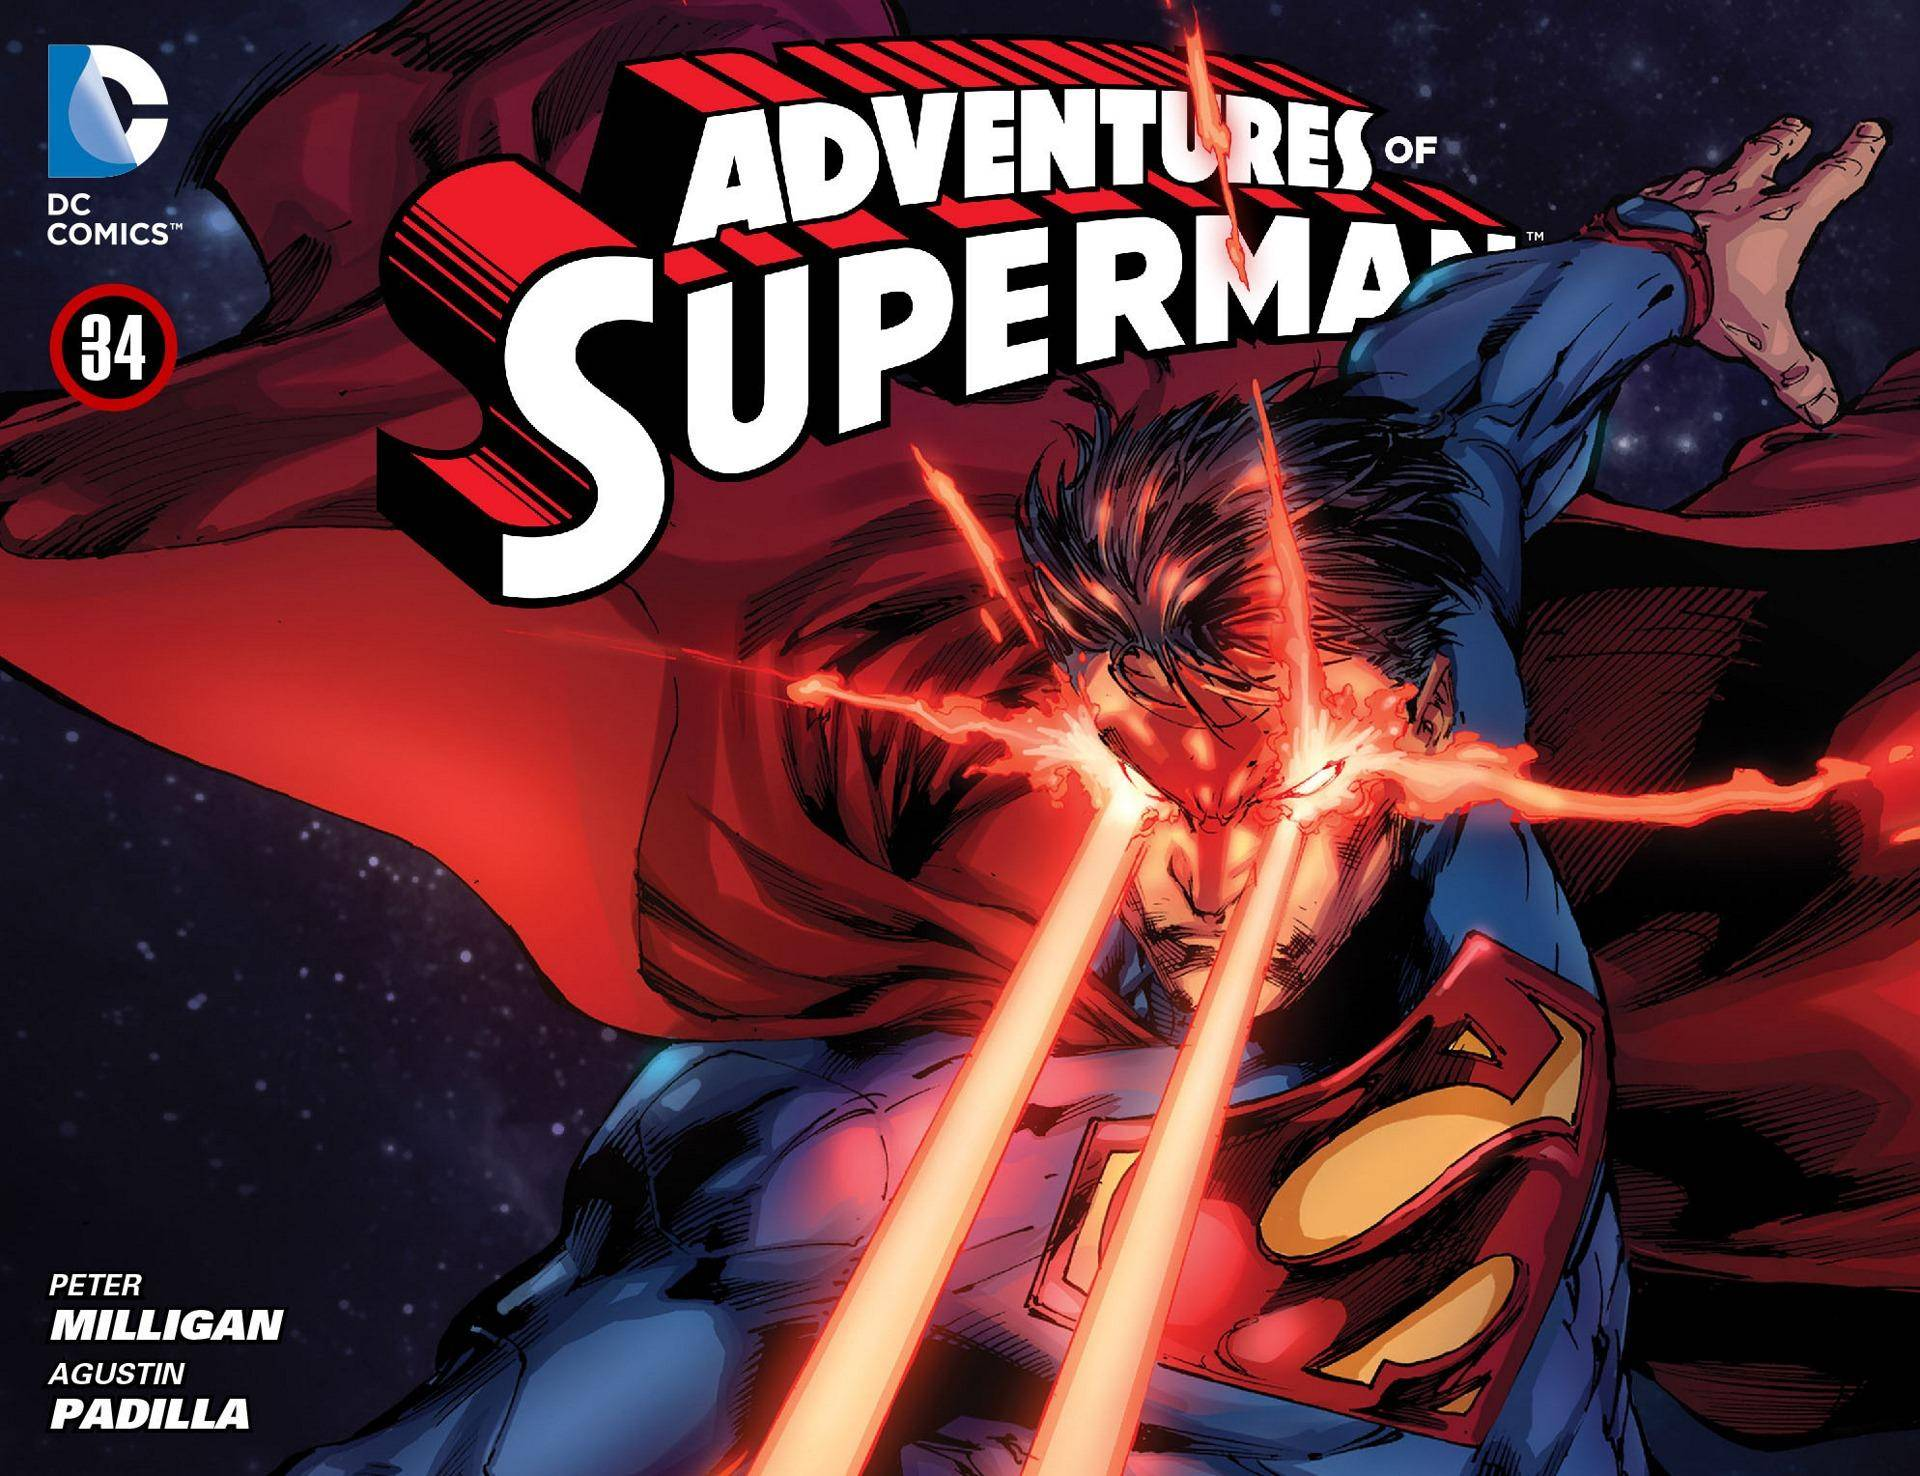 Adventures of Superman 034 2013 Digital